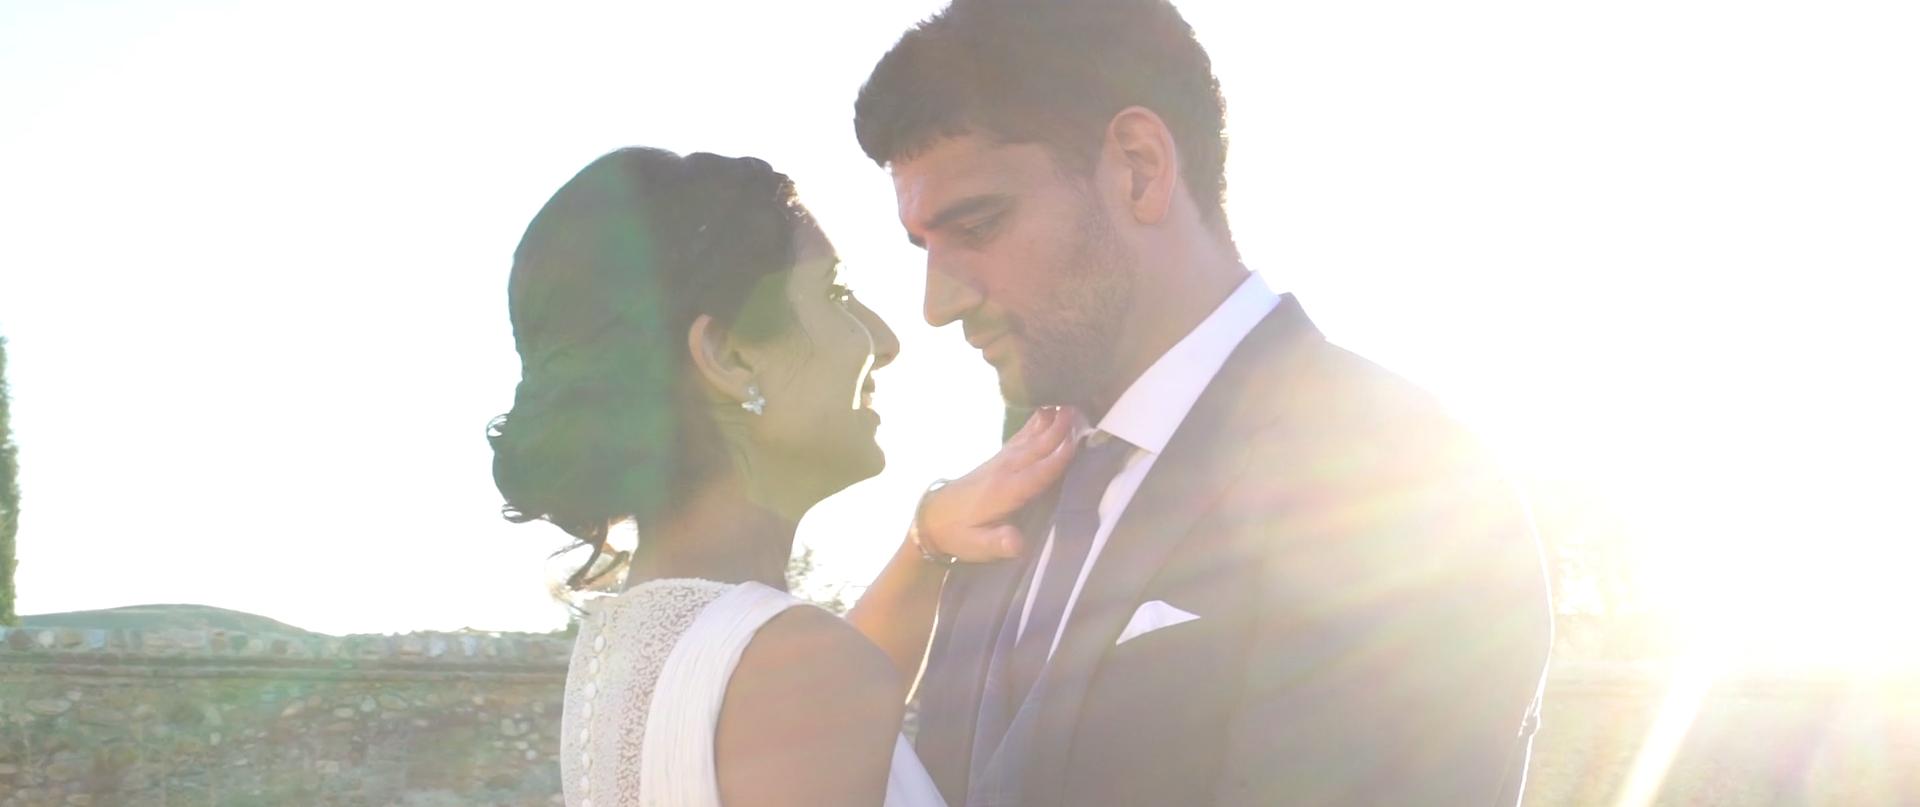 La boda de Chito y Irene en Madrid, Madrid